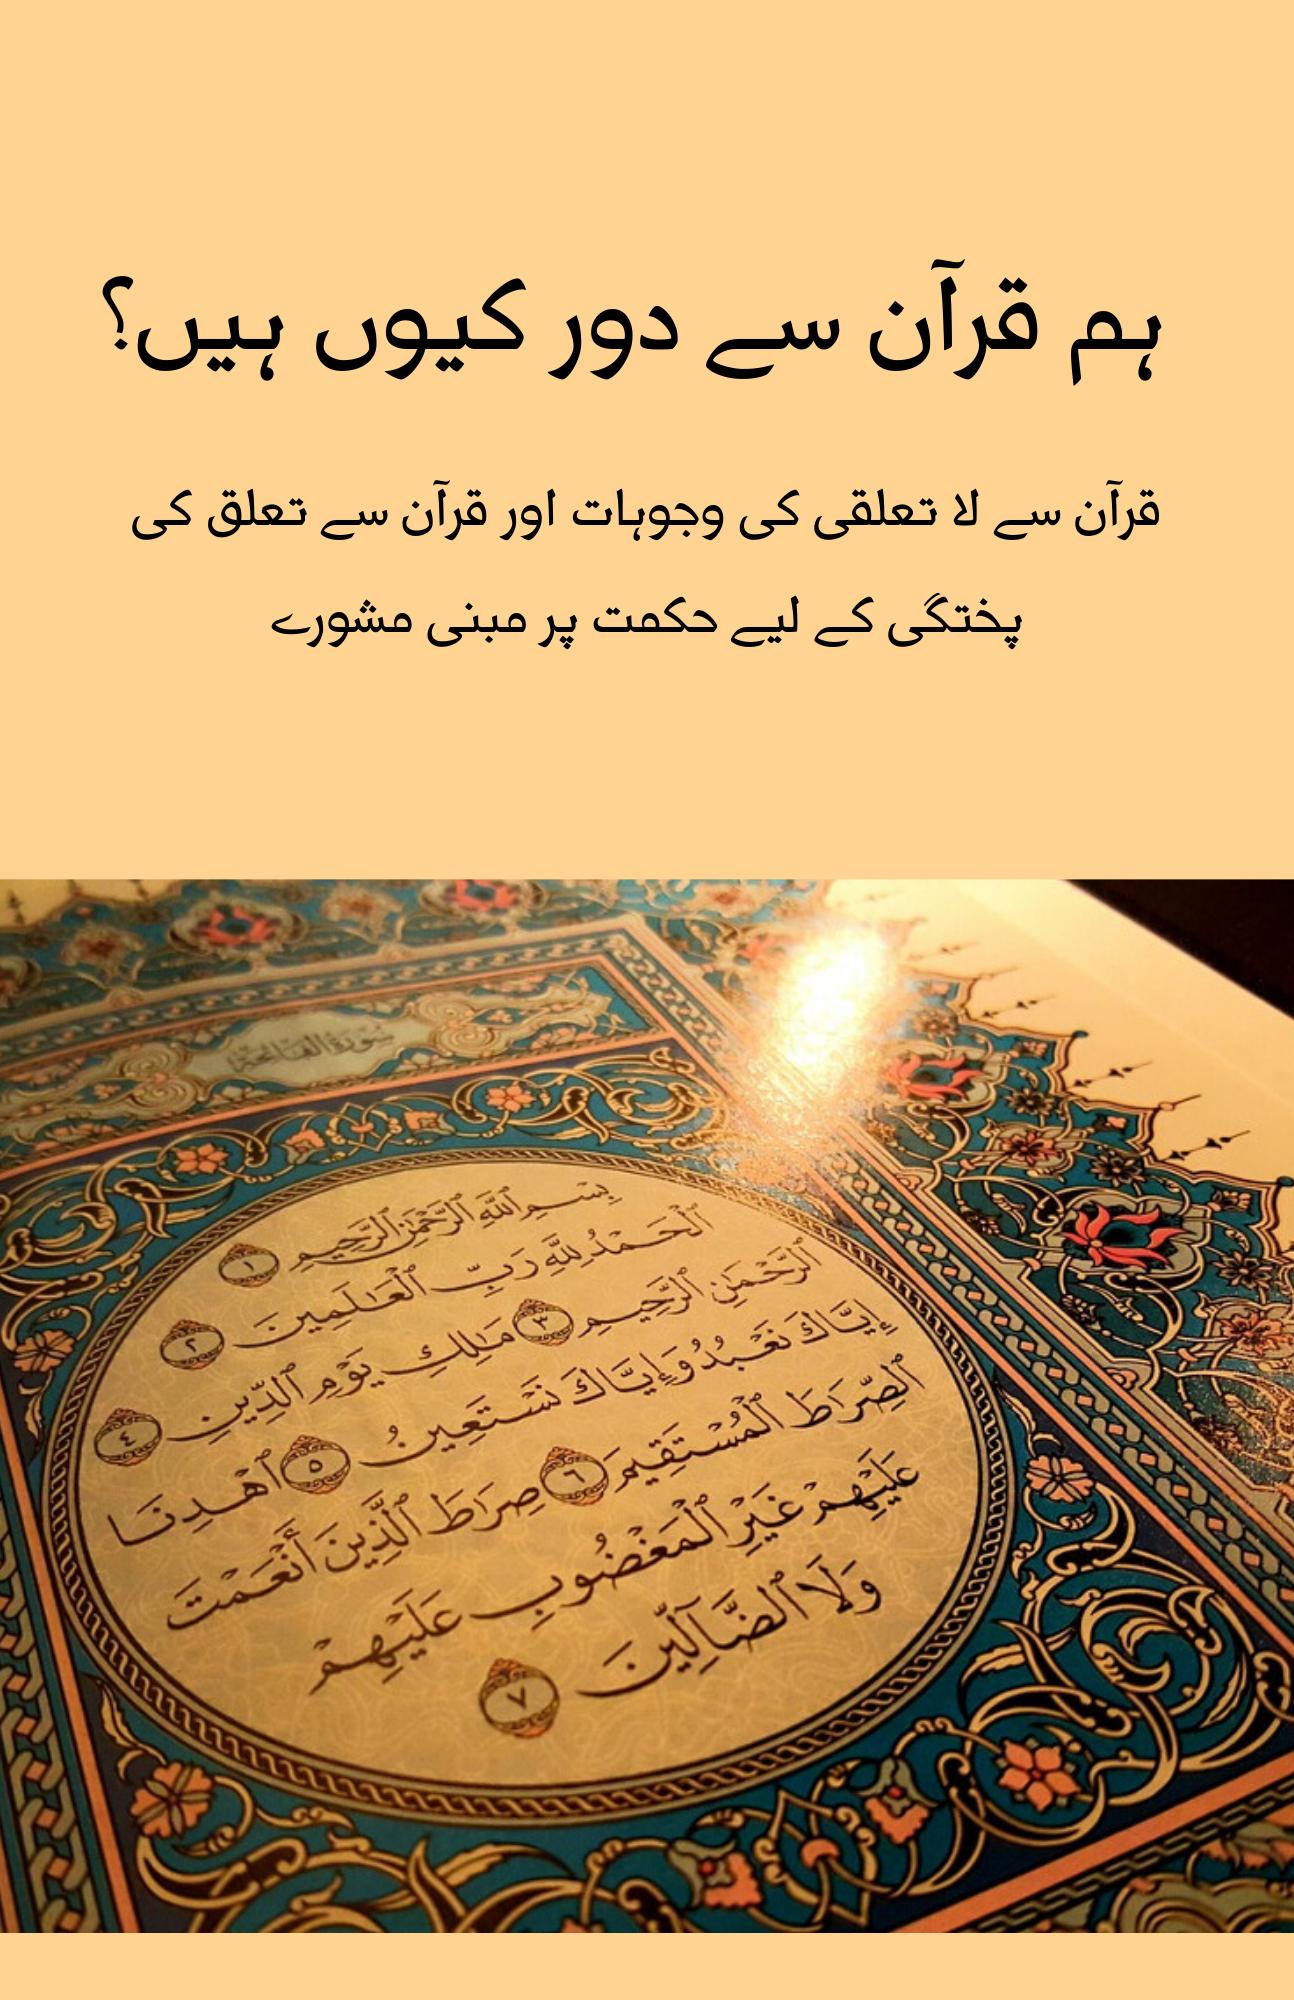 Quran sey doori